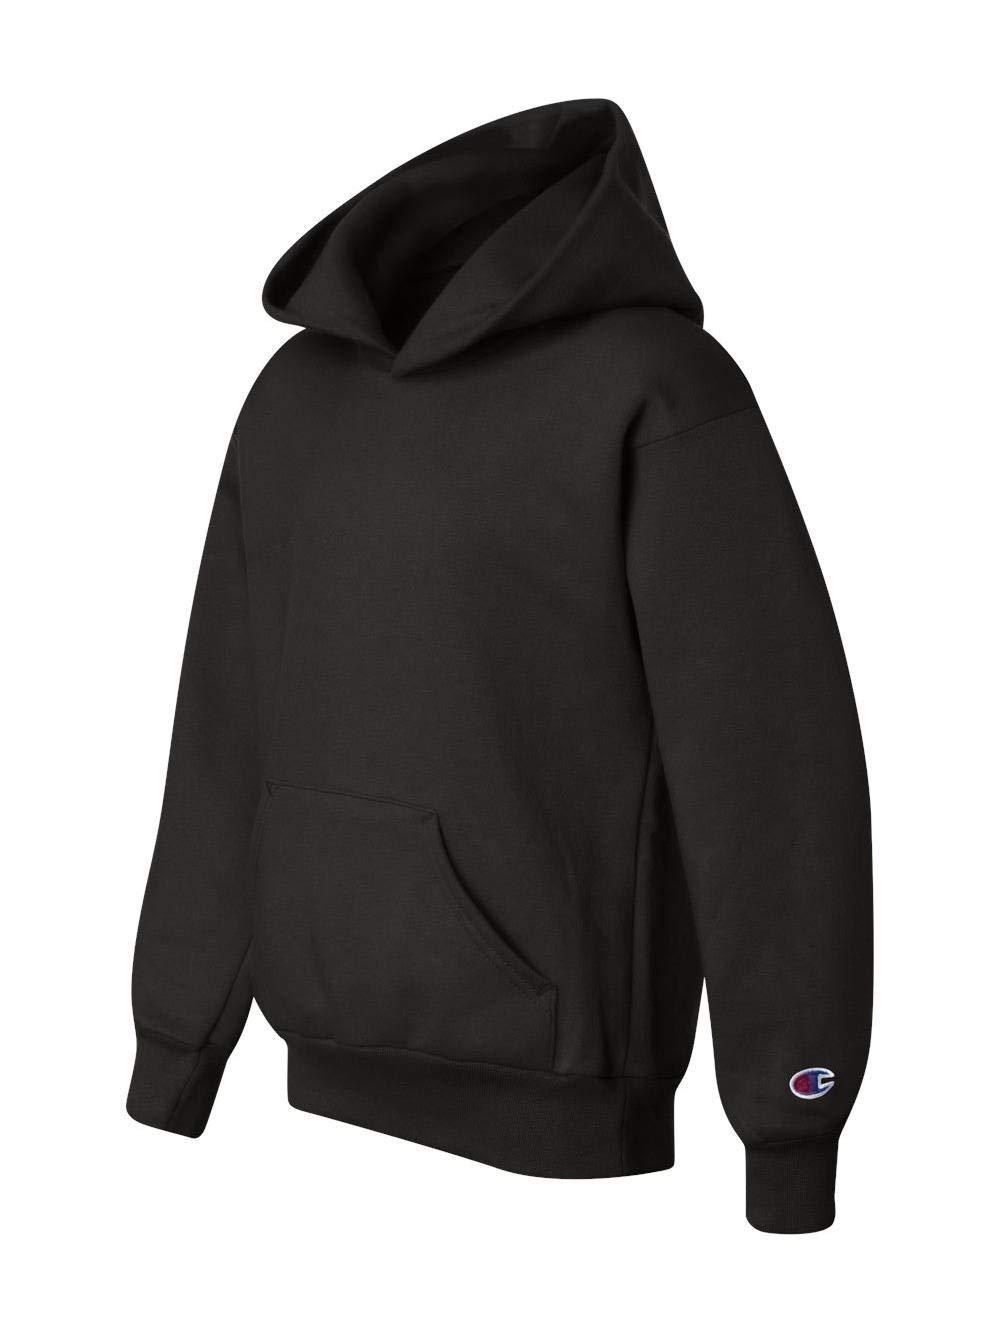 Champion Boys Boys' Big' Powerblend Eco Fleece Pullover Hoodie, Black, XL